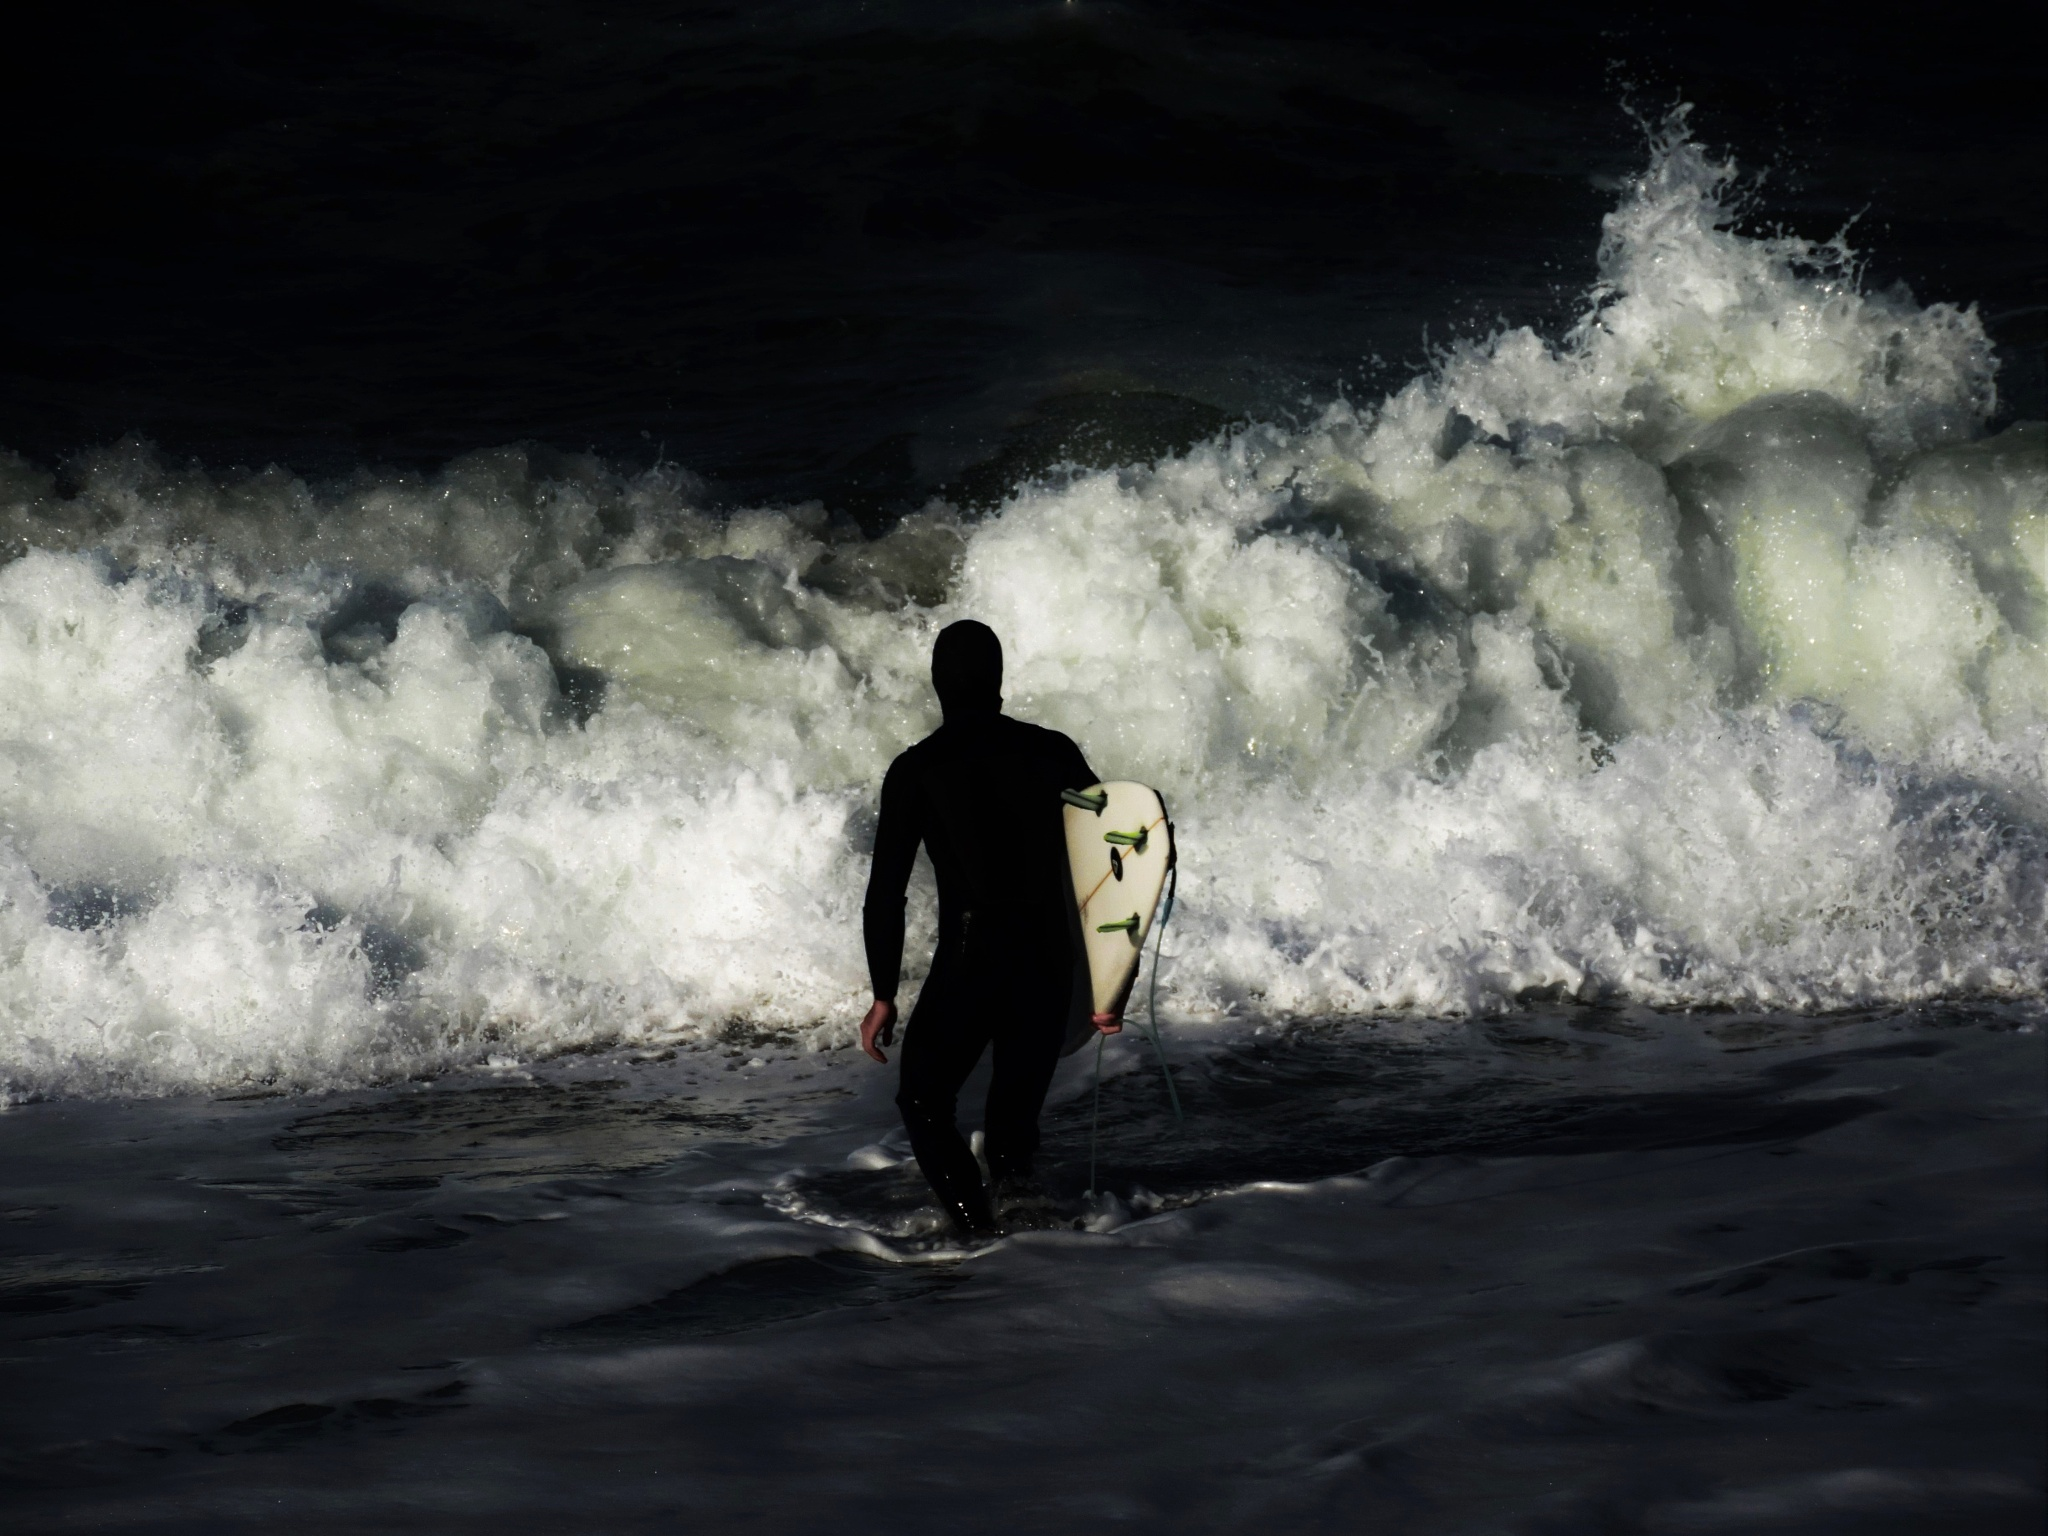 The wave. - La ola by Poldarkk